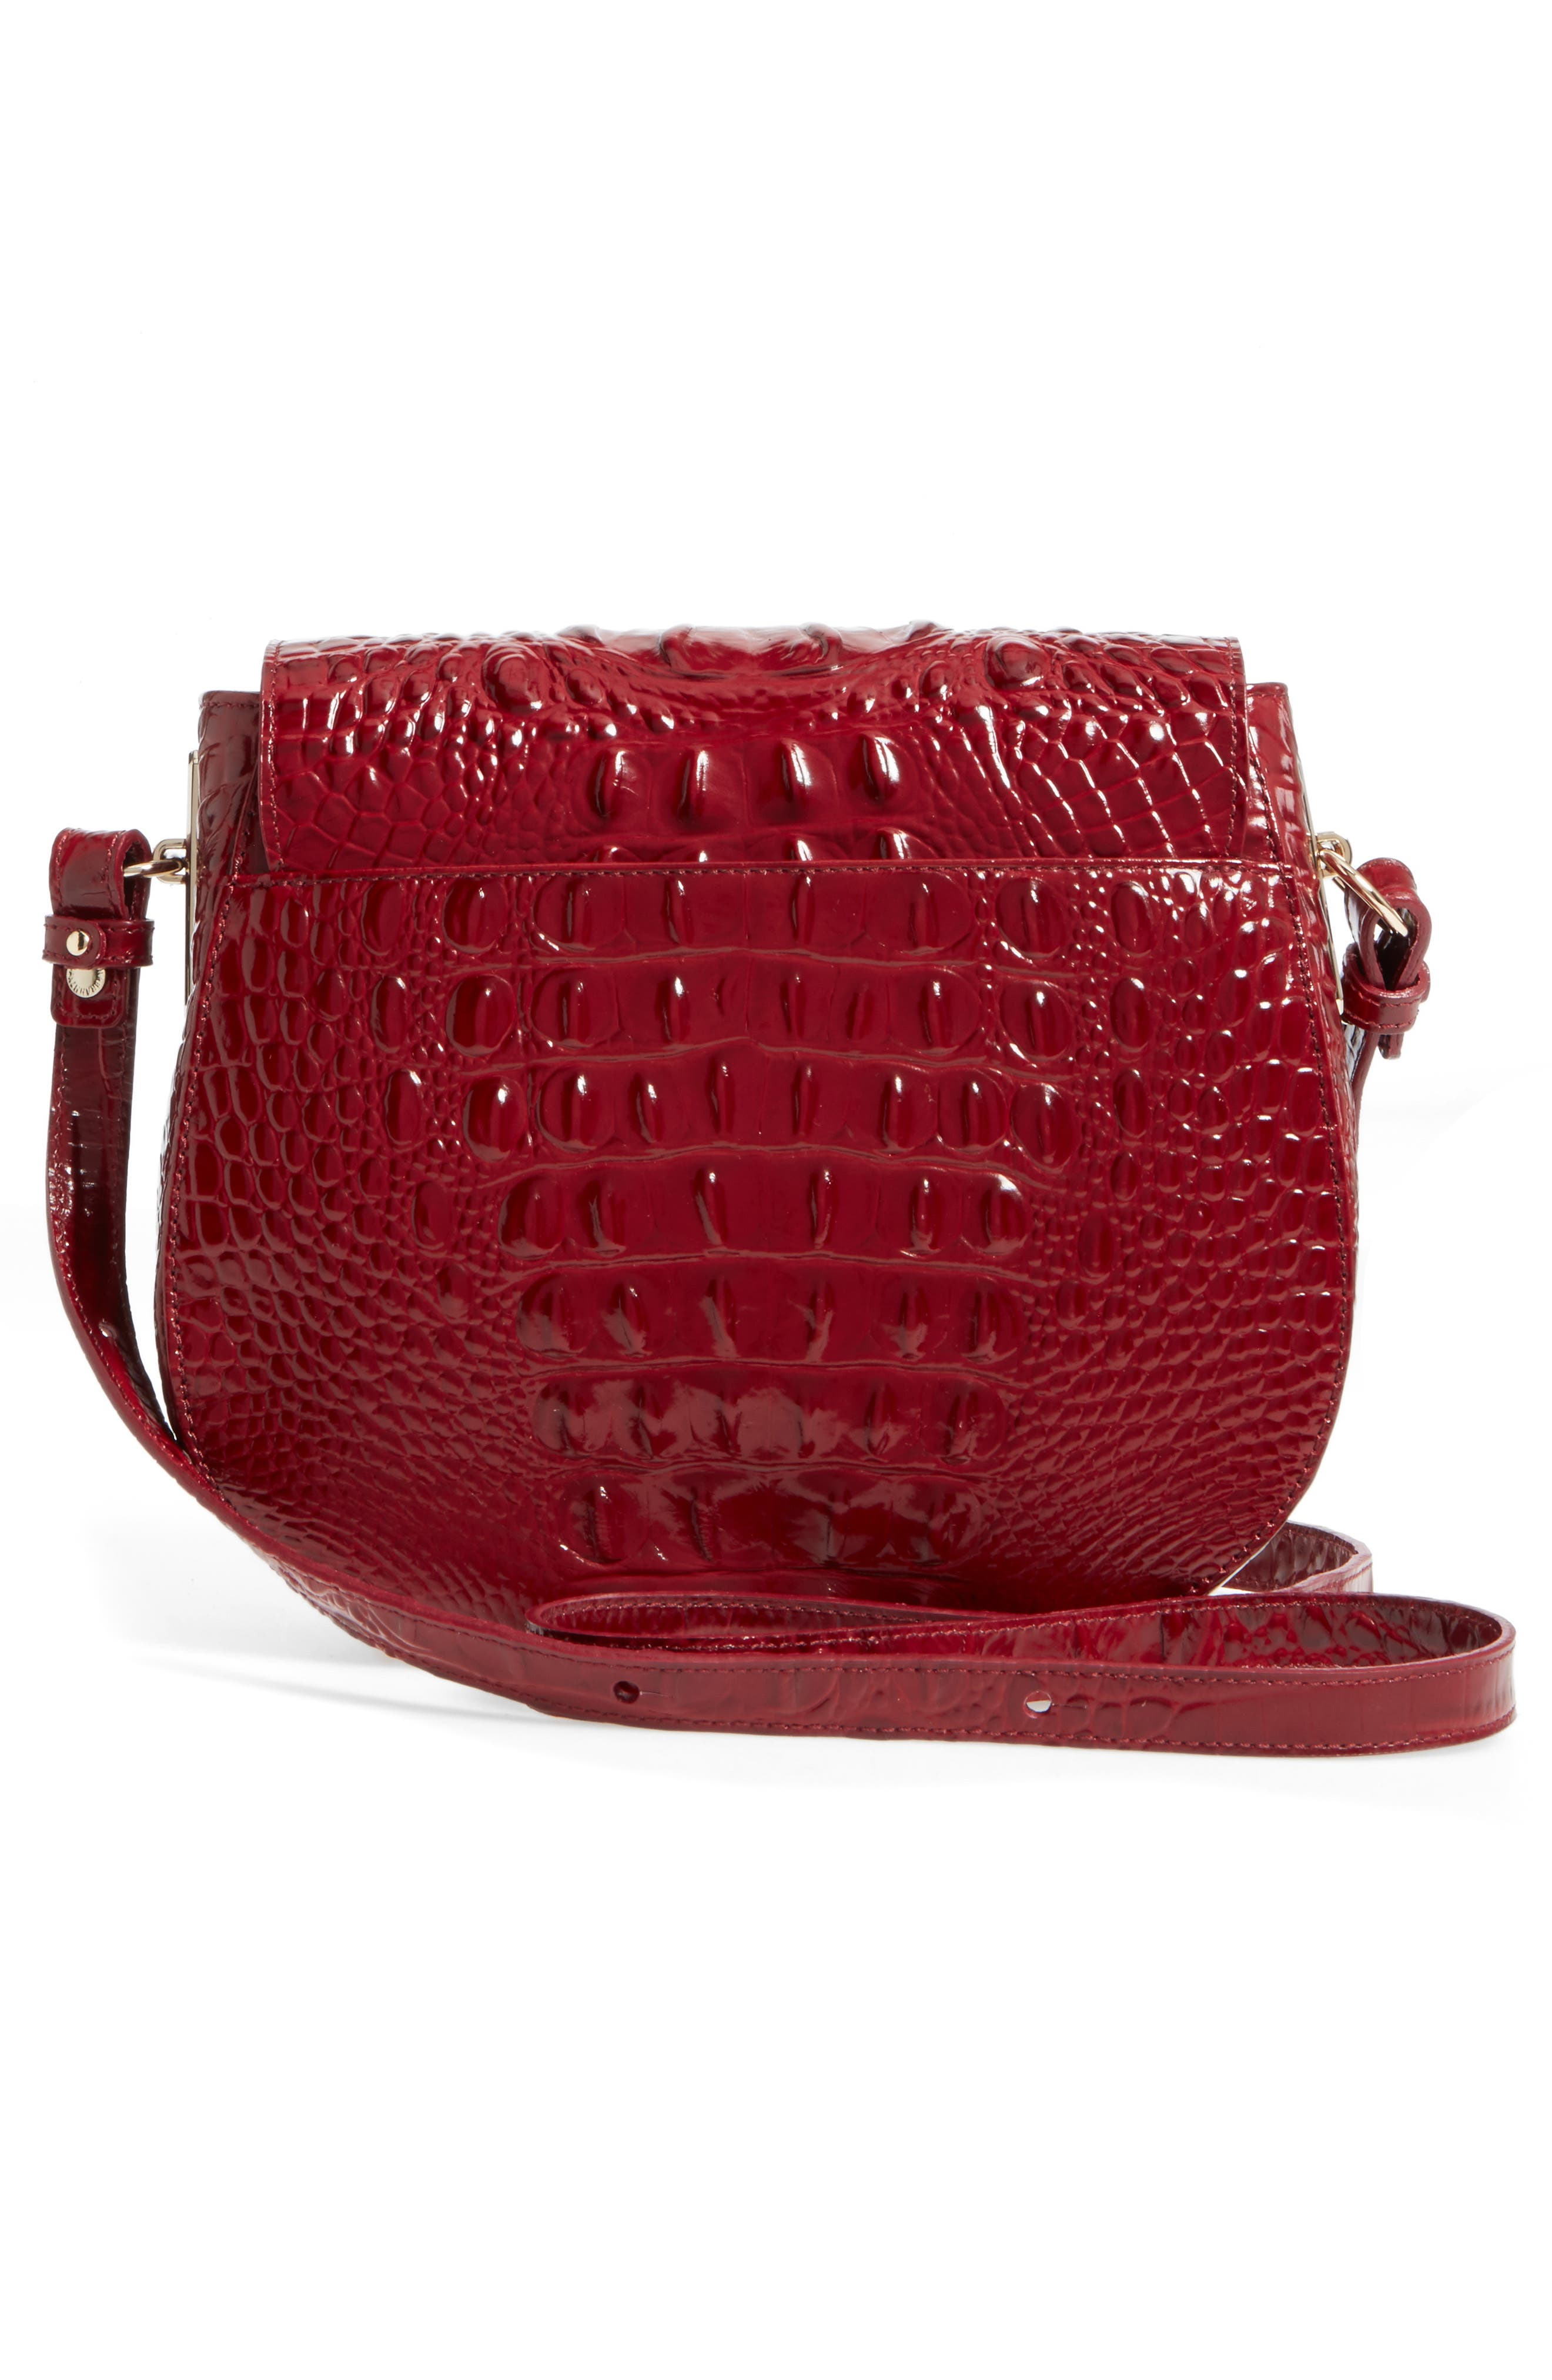 Melbourne - Lizzie Leather Crossbody Bag,                             Alternate thumbnail 15, color,